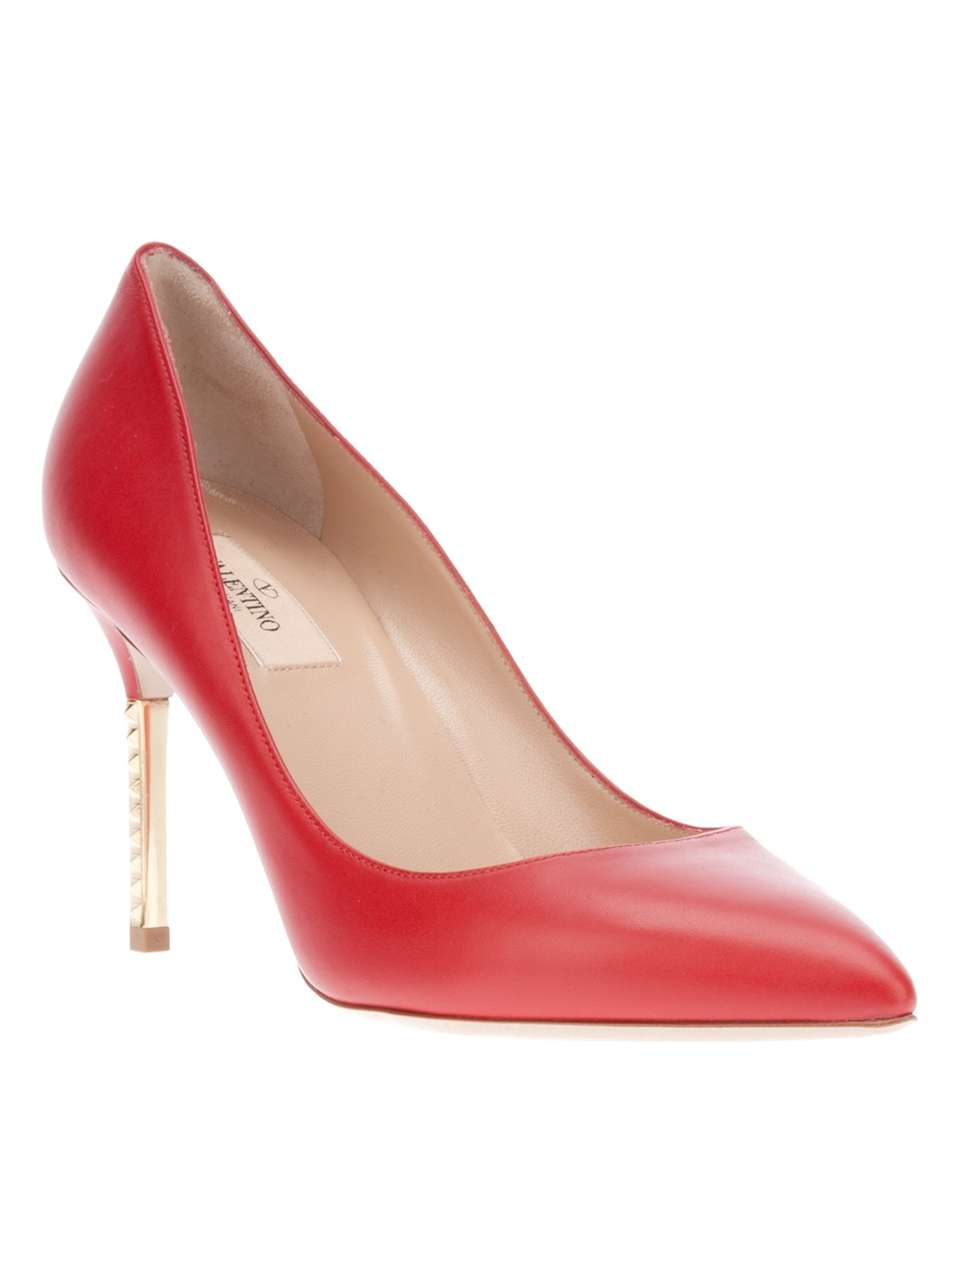 Llamativos zapatos baratos para fiesta 2016 zapatos - Zapatos de seguridad baratos ...